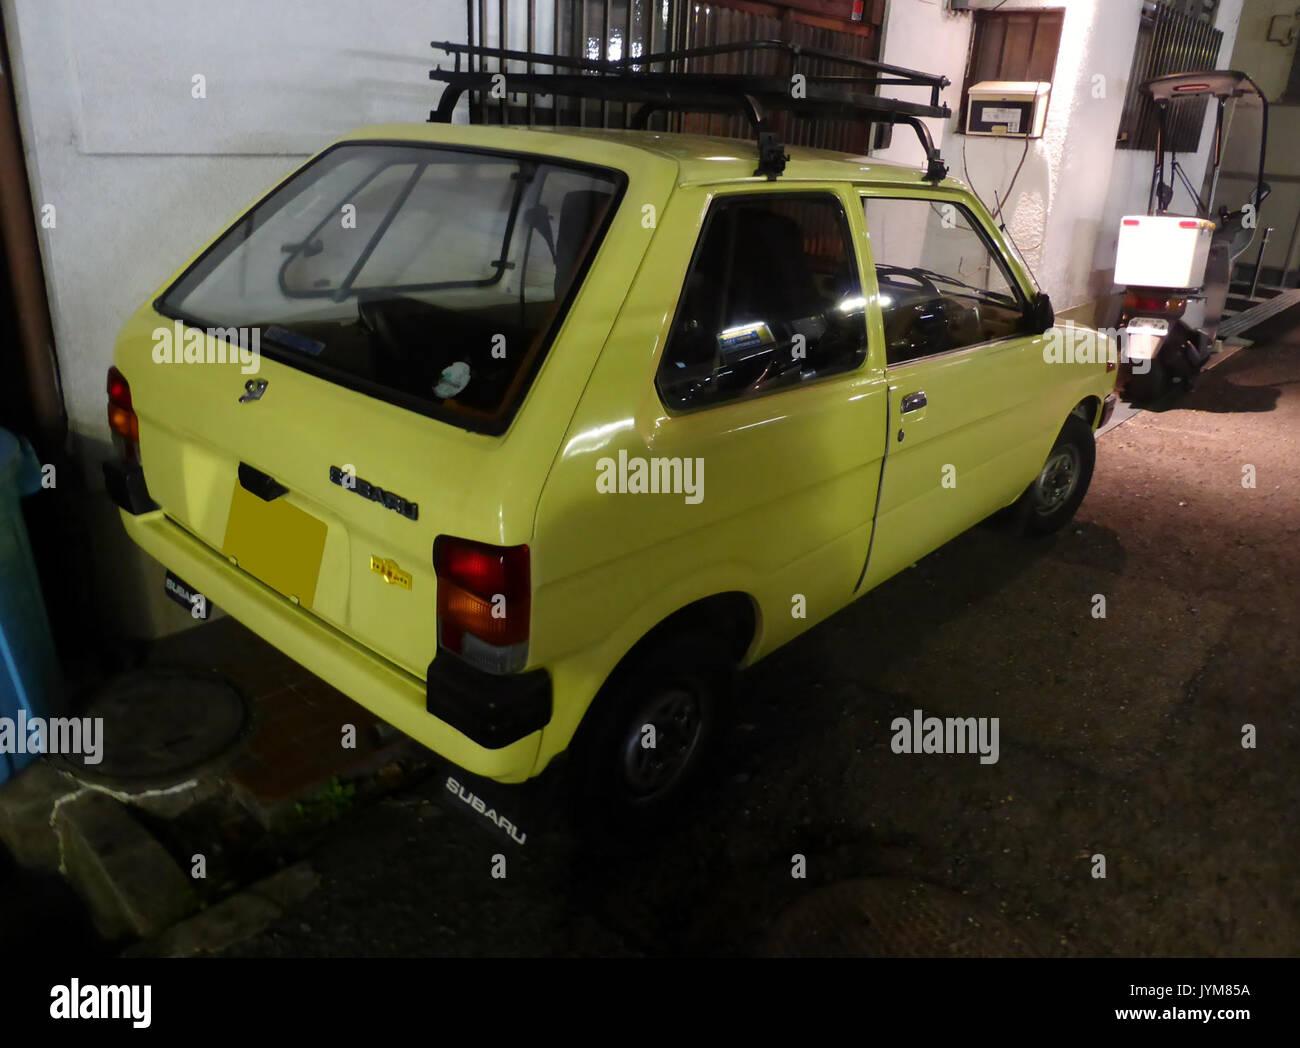 2nd Generation Subaru Rex U At Night Rear Stock Photo 154724118 Alamy